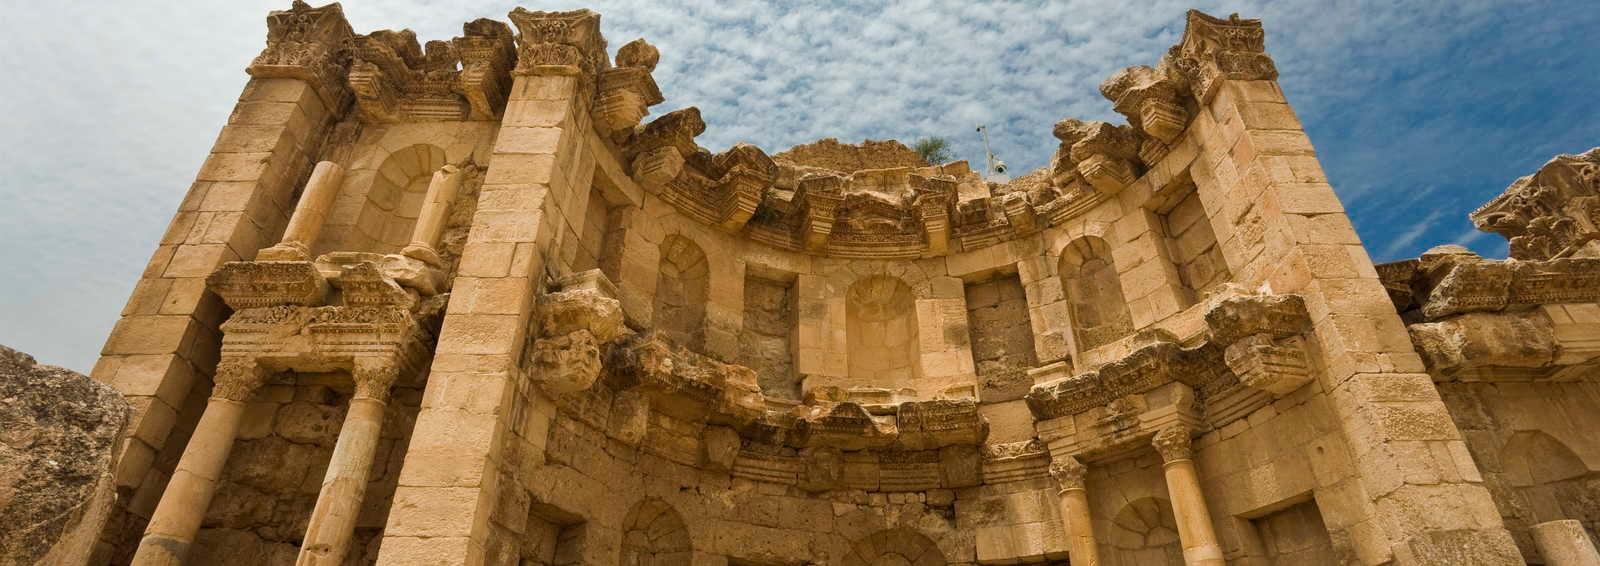 The Nymphaeum in Jerash